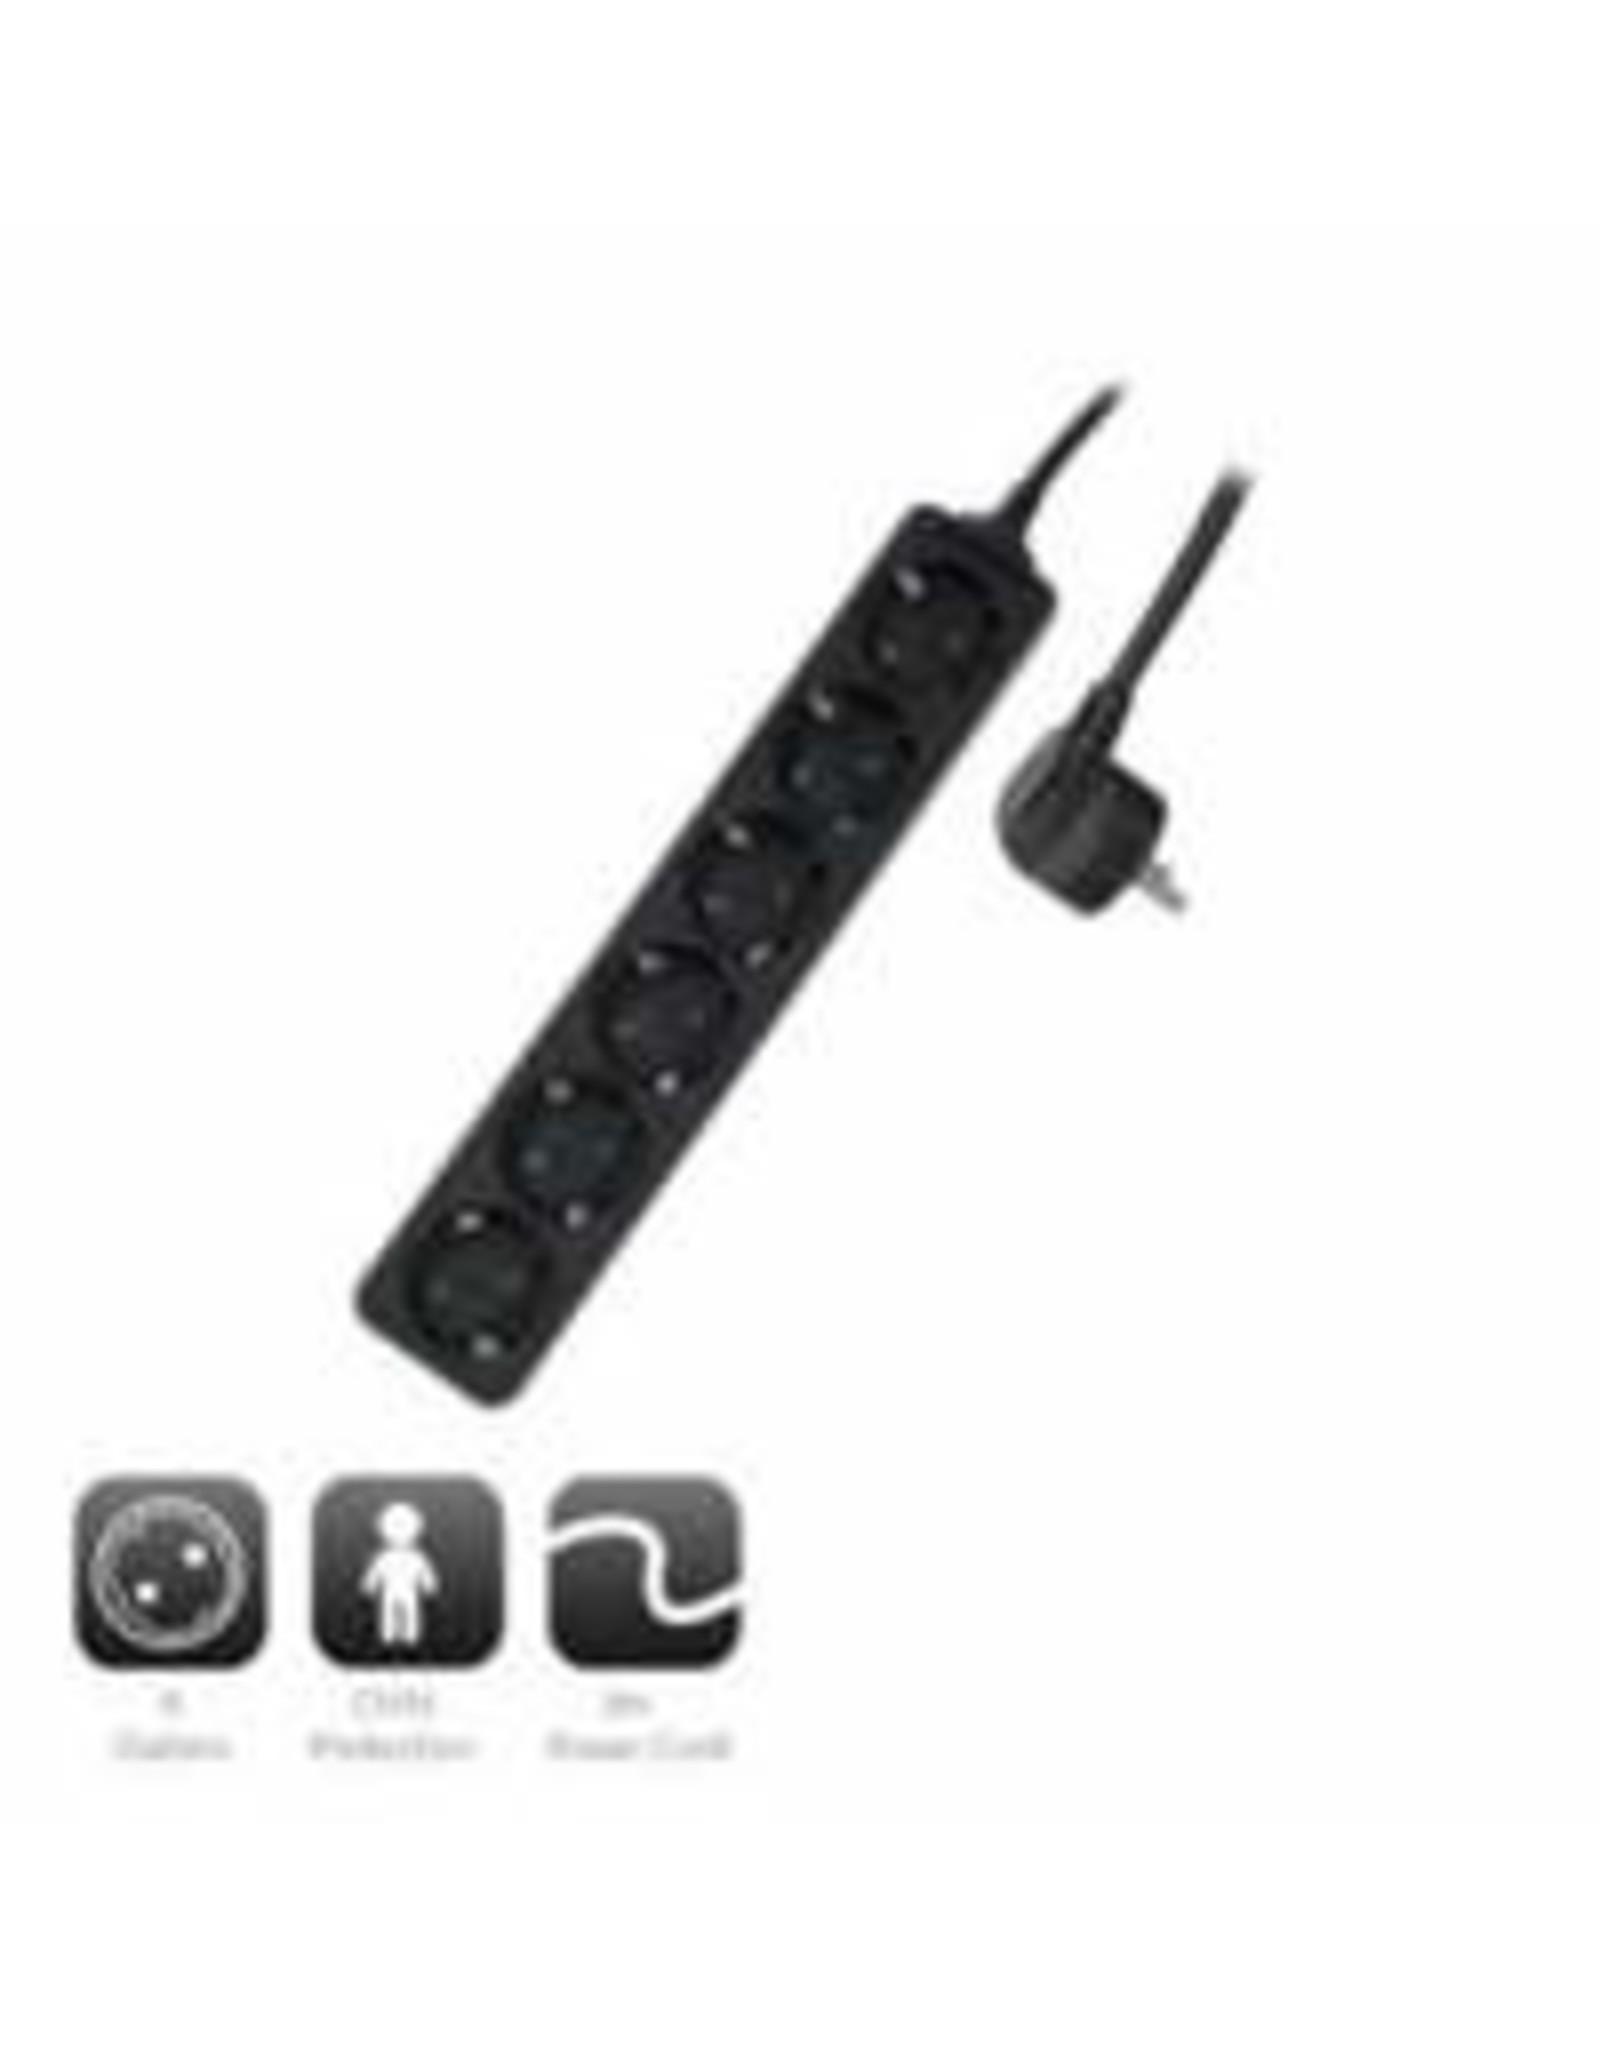 Ewent Power Strip Black, 6 plugs, 3.0m, German version